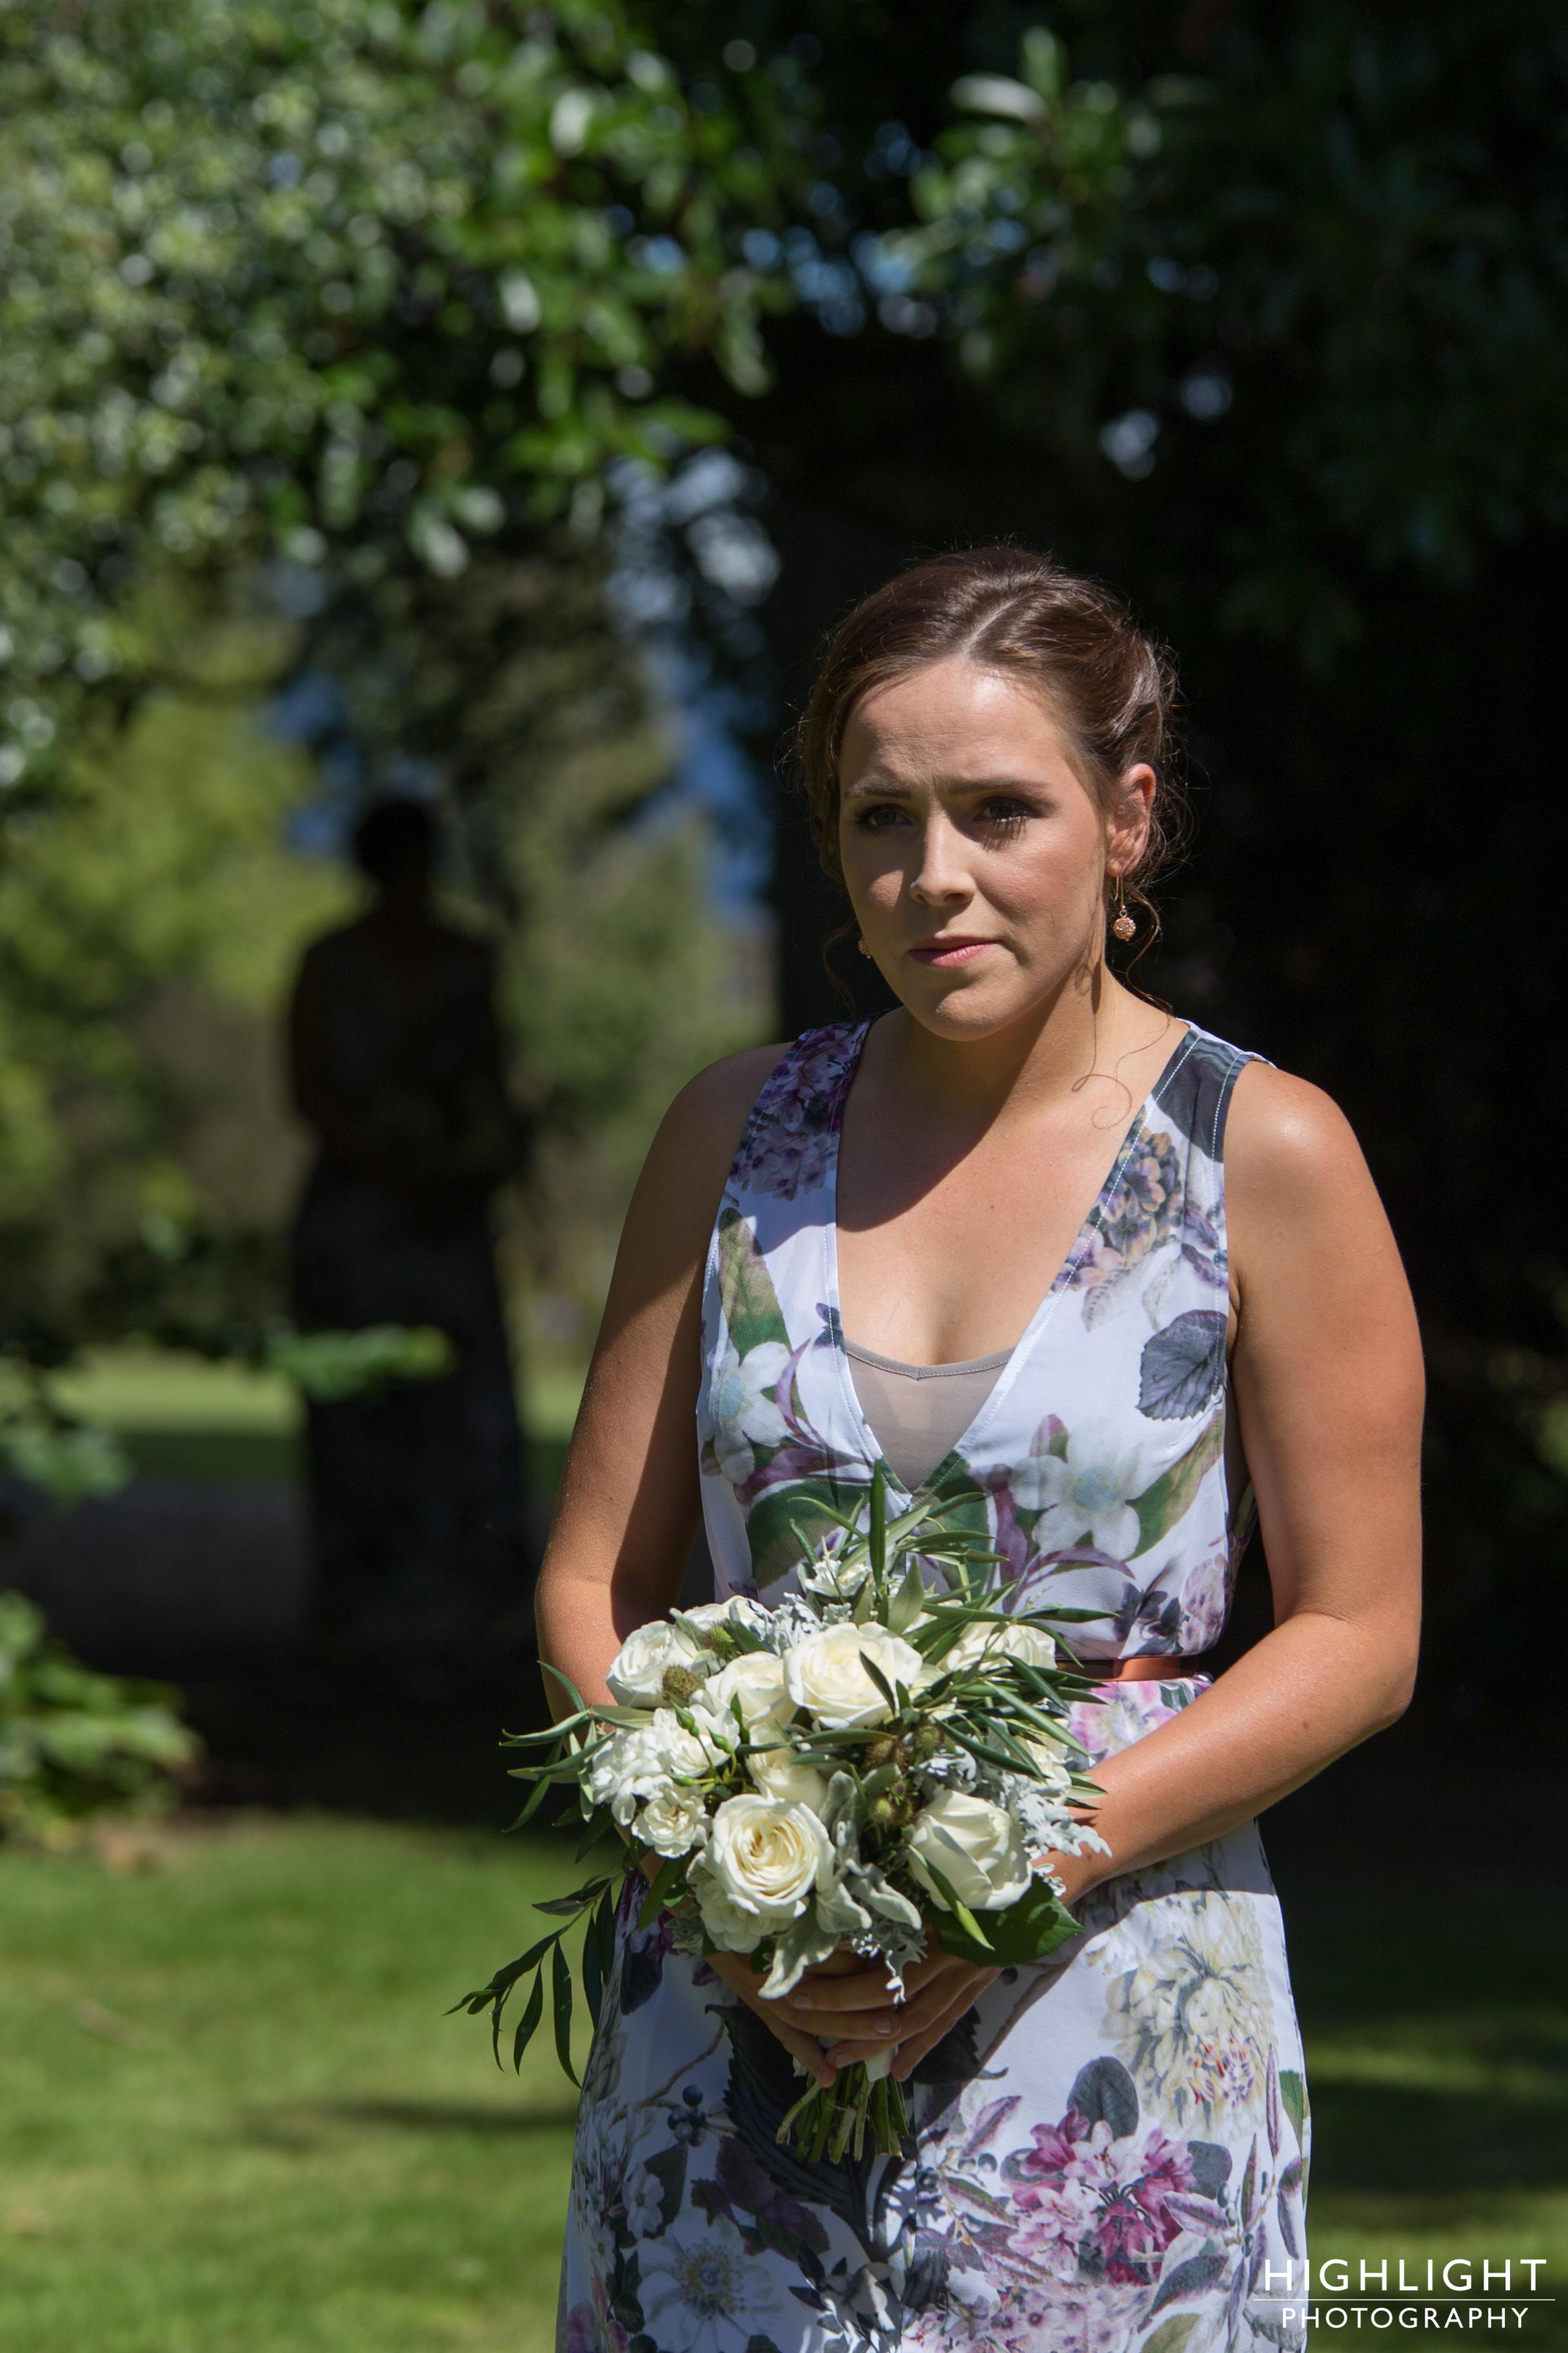 rose-johnny-highlight-wedding-photographer-palmerston-north-manawatu